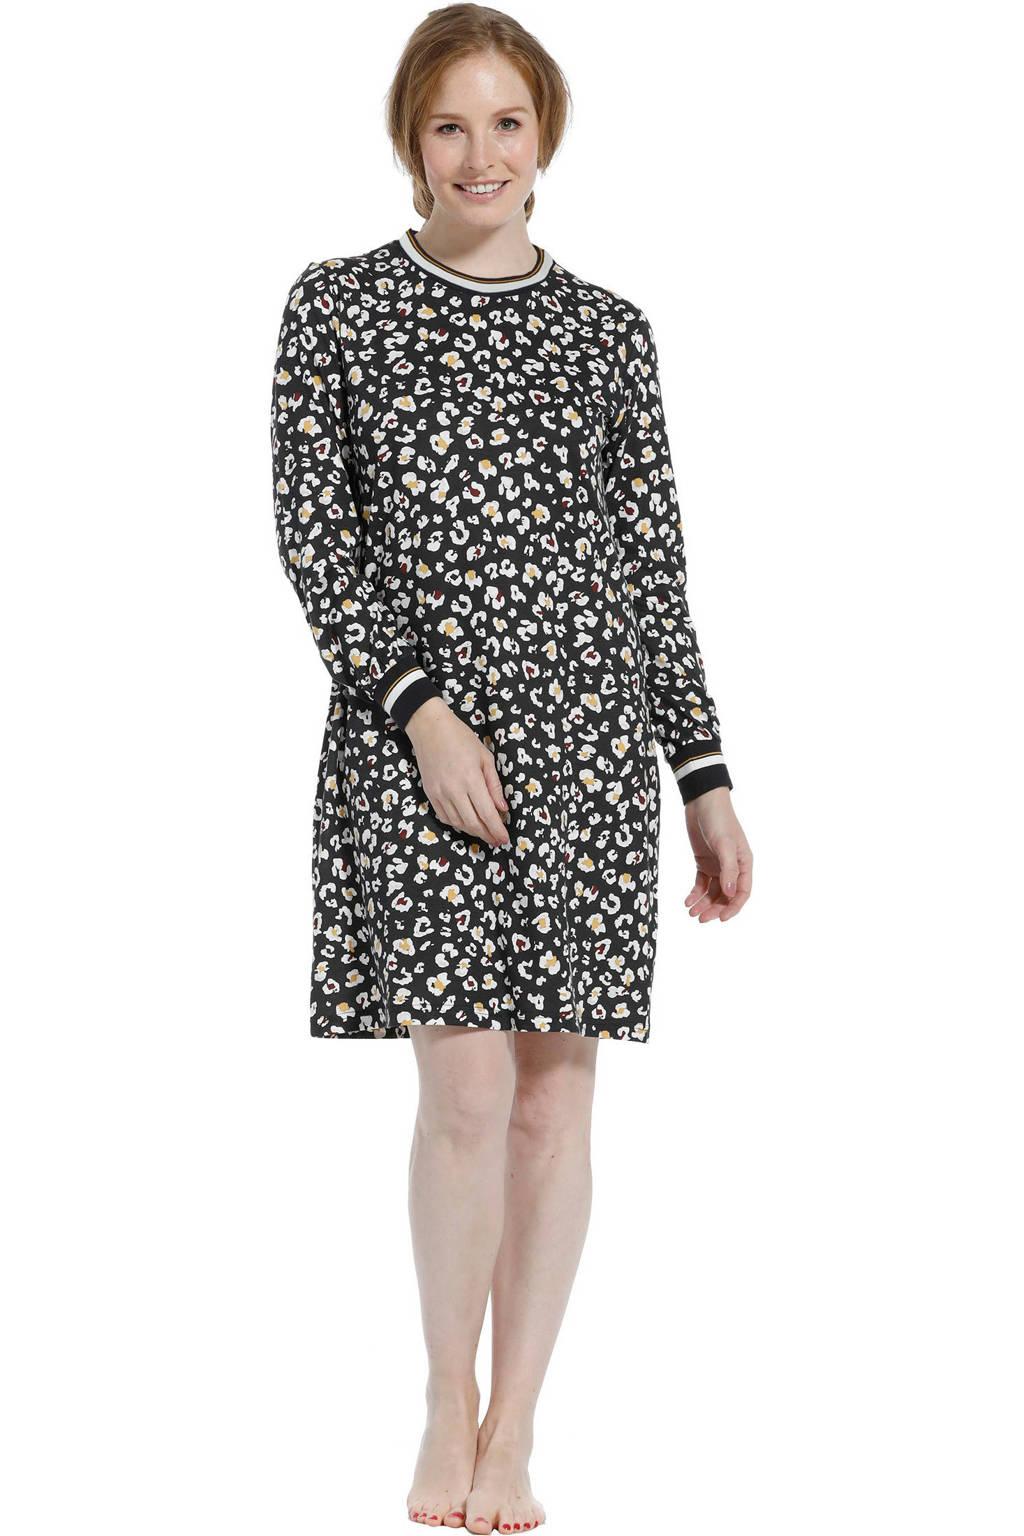 Pastunette nachthemd met all over print donkergrijs/wit, Donkergrijs/wit